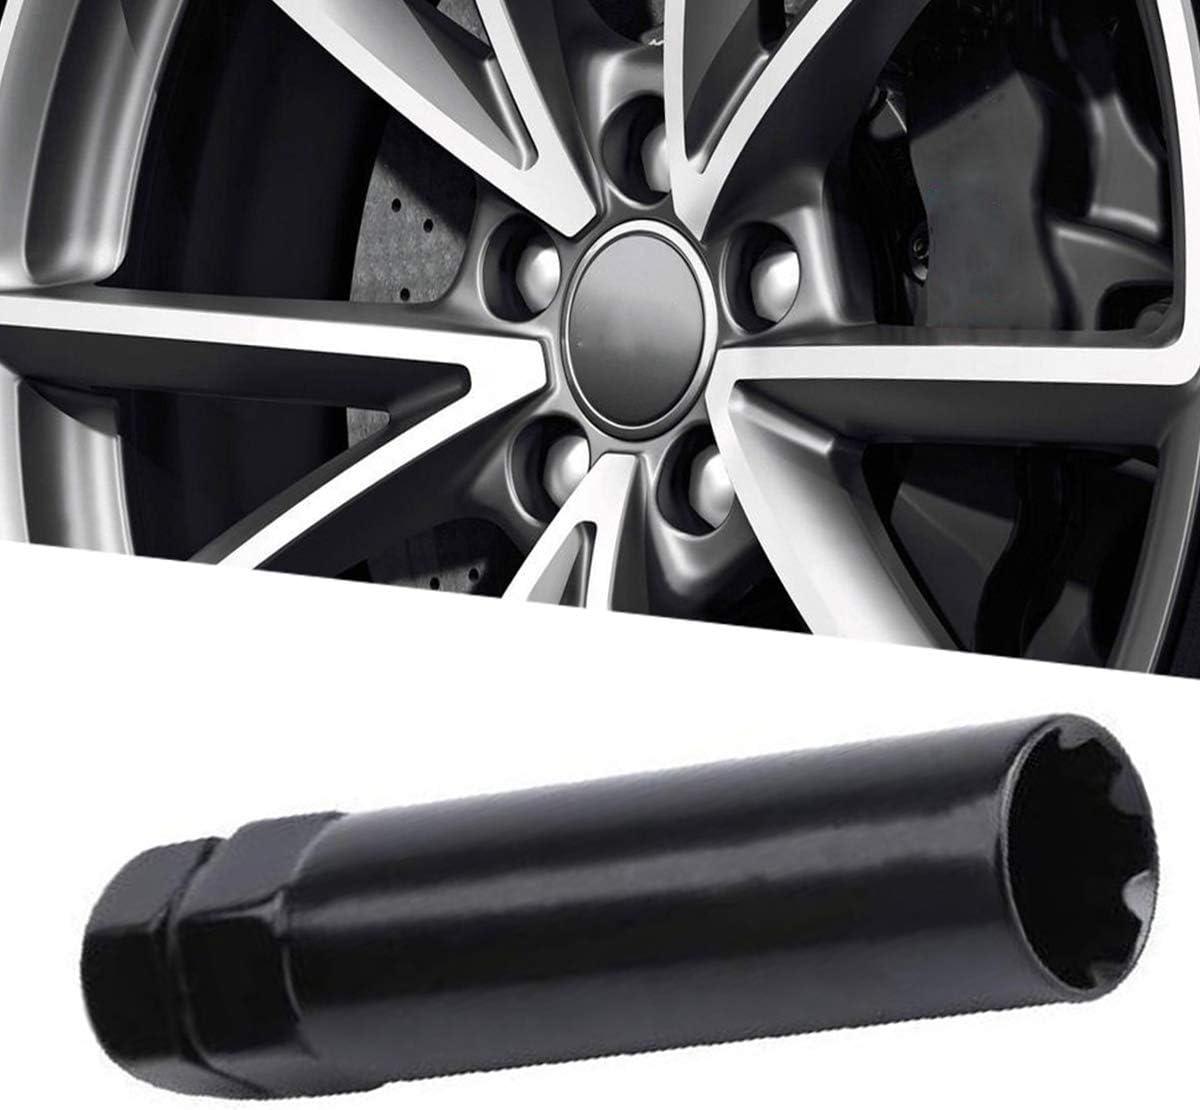 Muhize Standard Drive Socket Lug Nut Tool Key Replacement 7 Point Spline Tuner Lug Nut Key